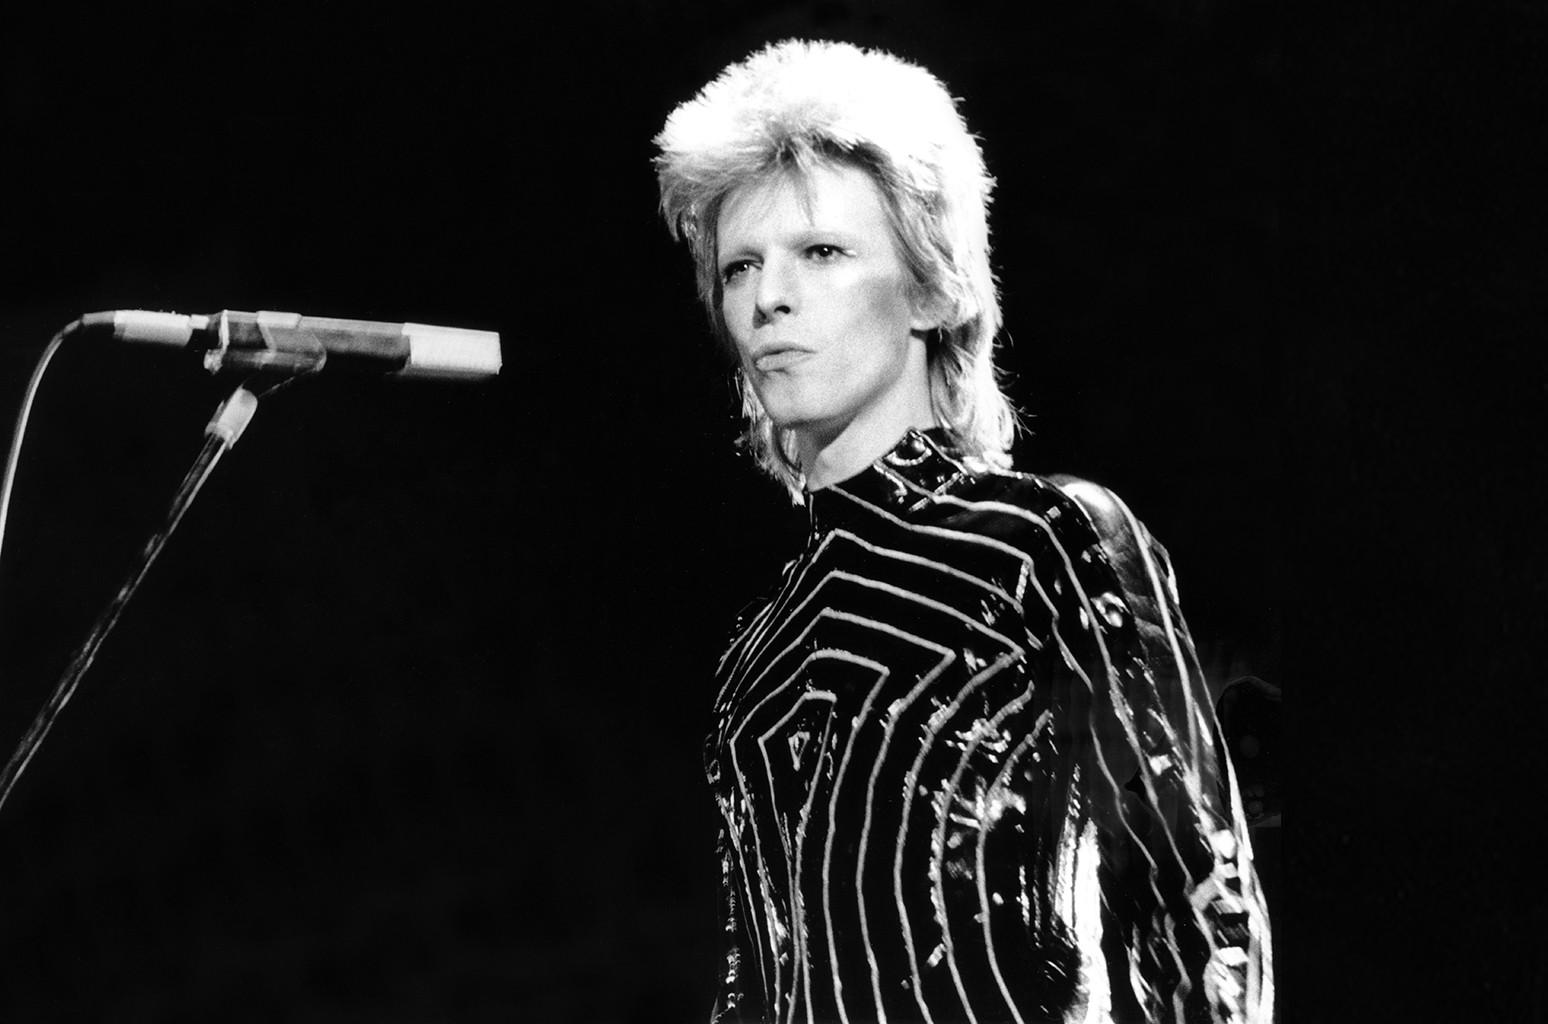 David Bowie performs as Ziggy Stardust